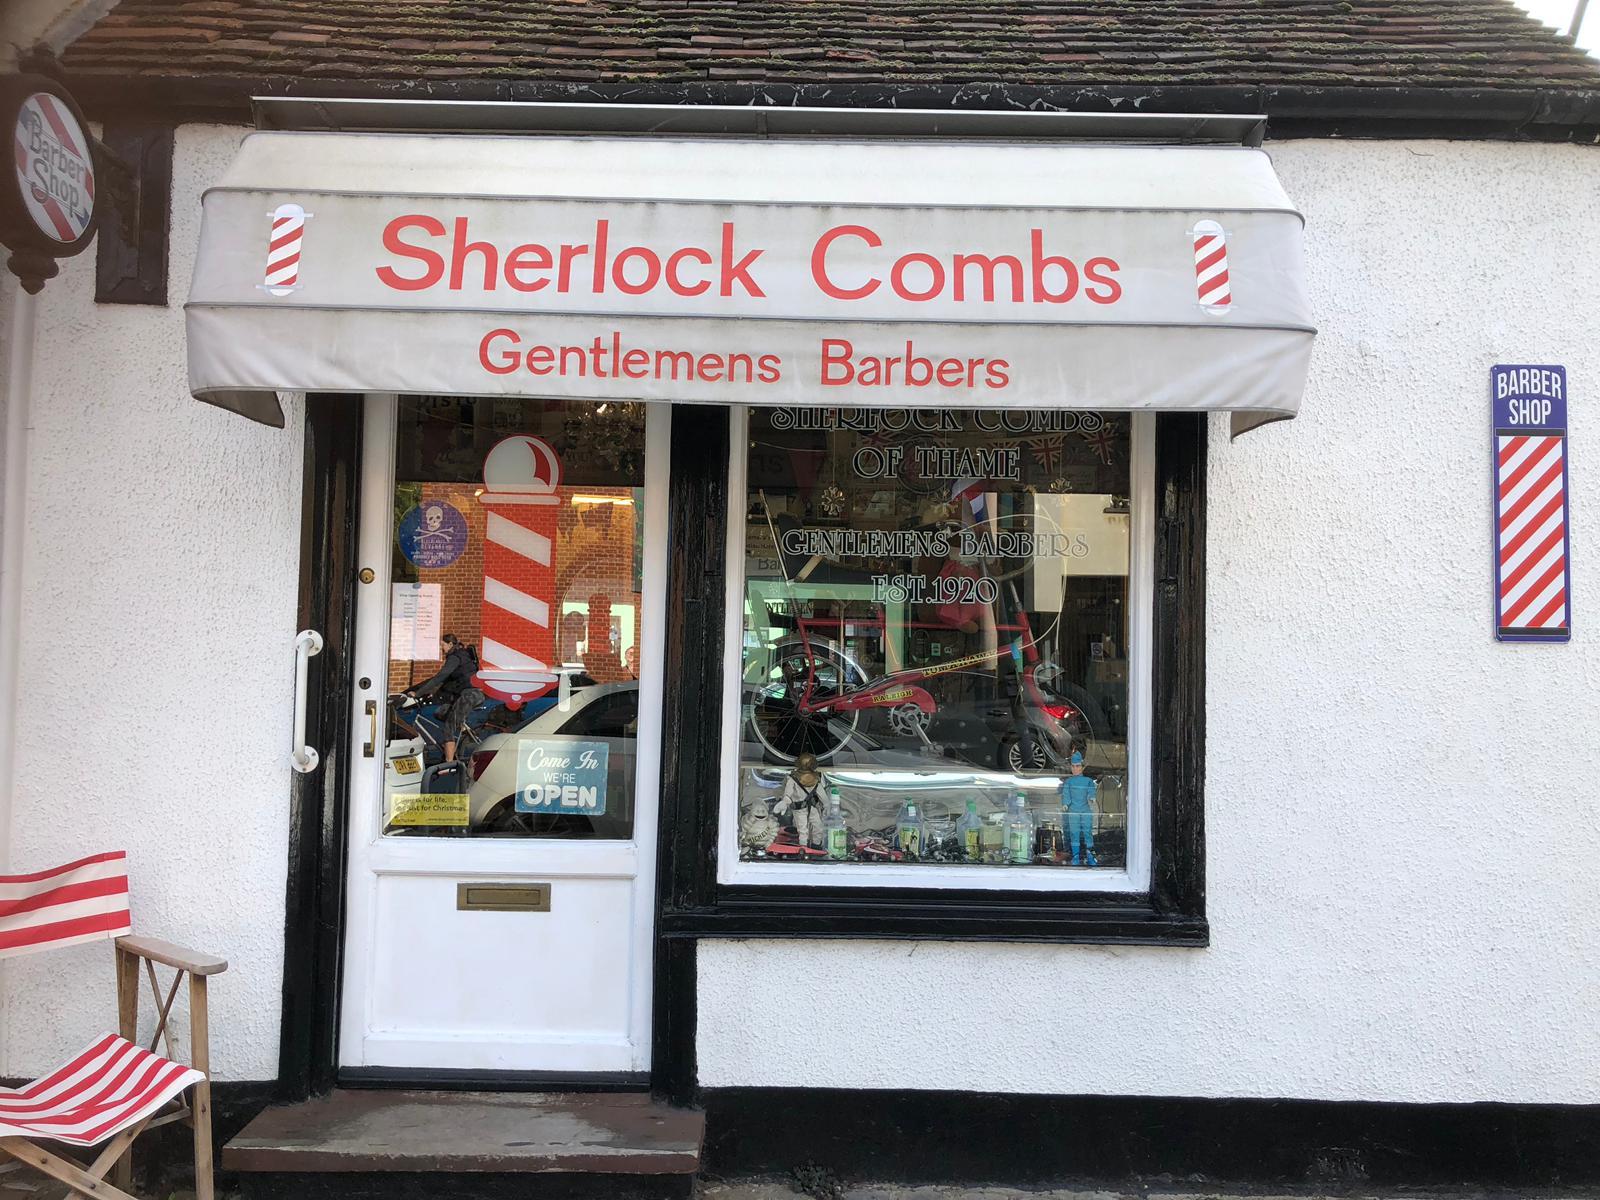 Sherlock Combs